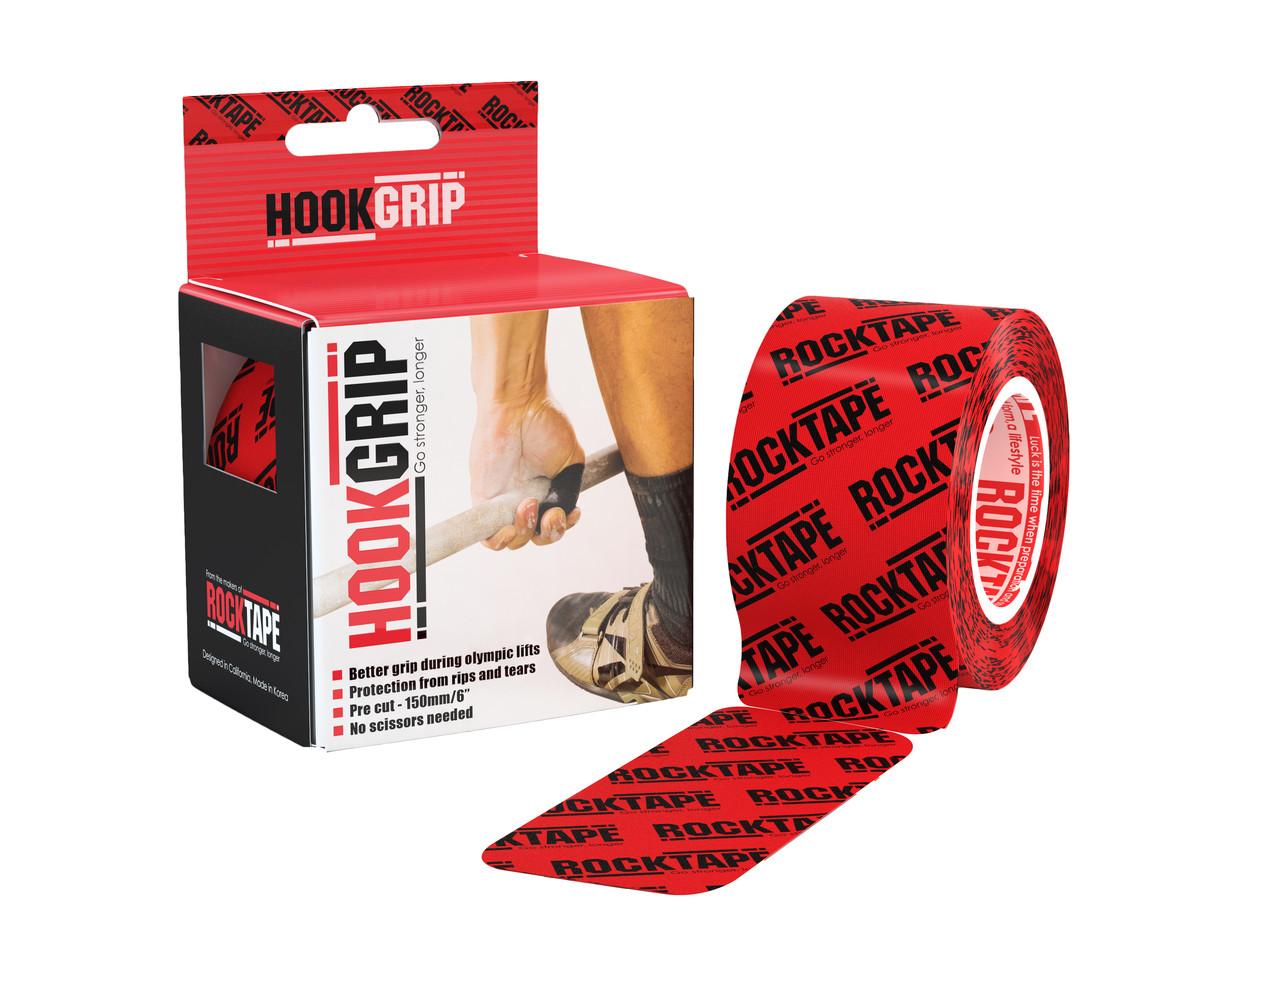 RockTape HookGrip, 5см х 5м, 32 отрезка